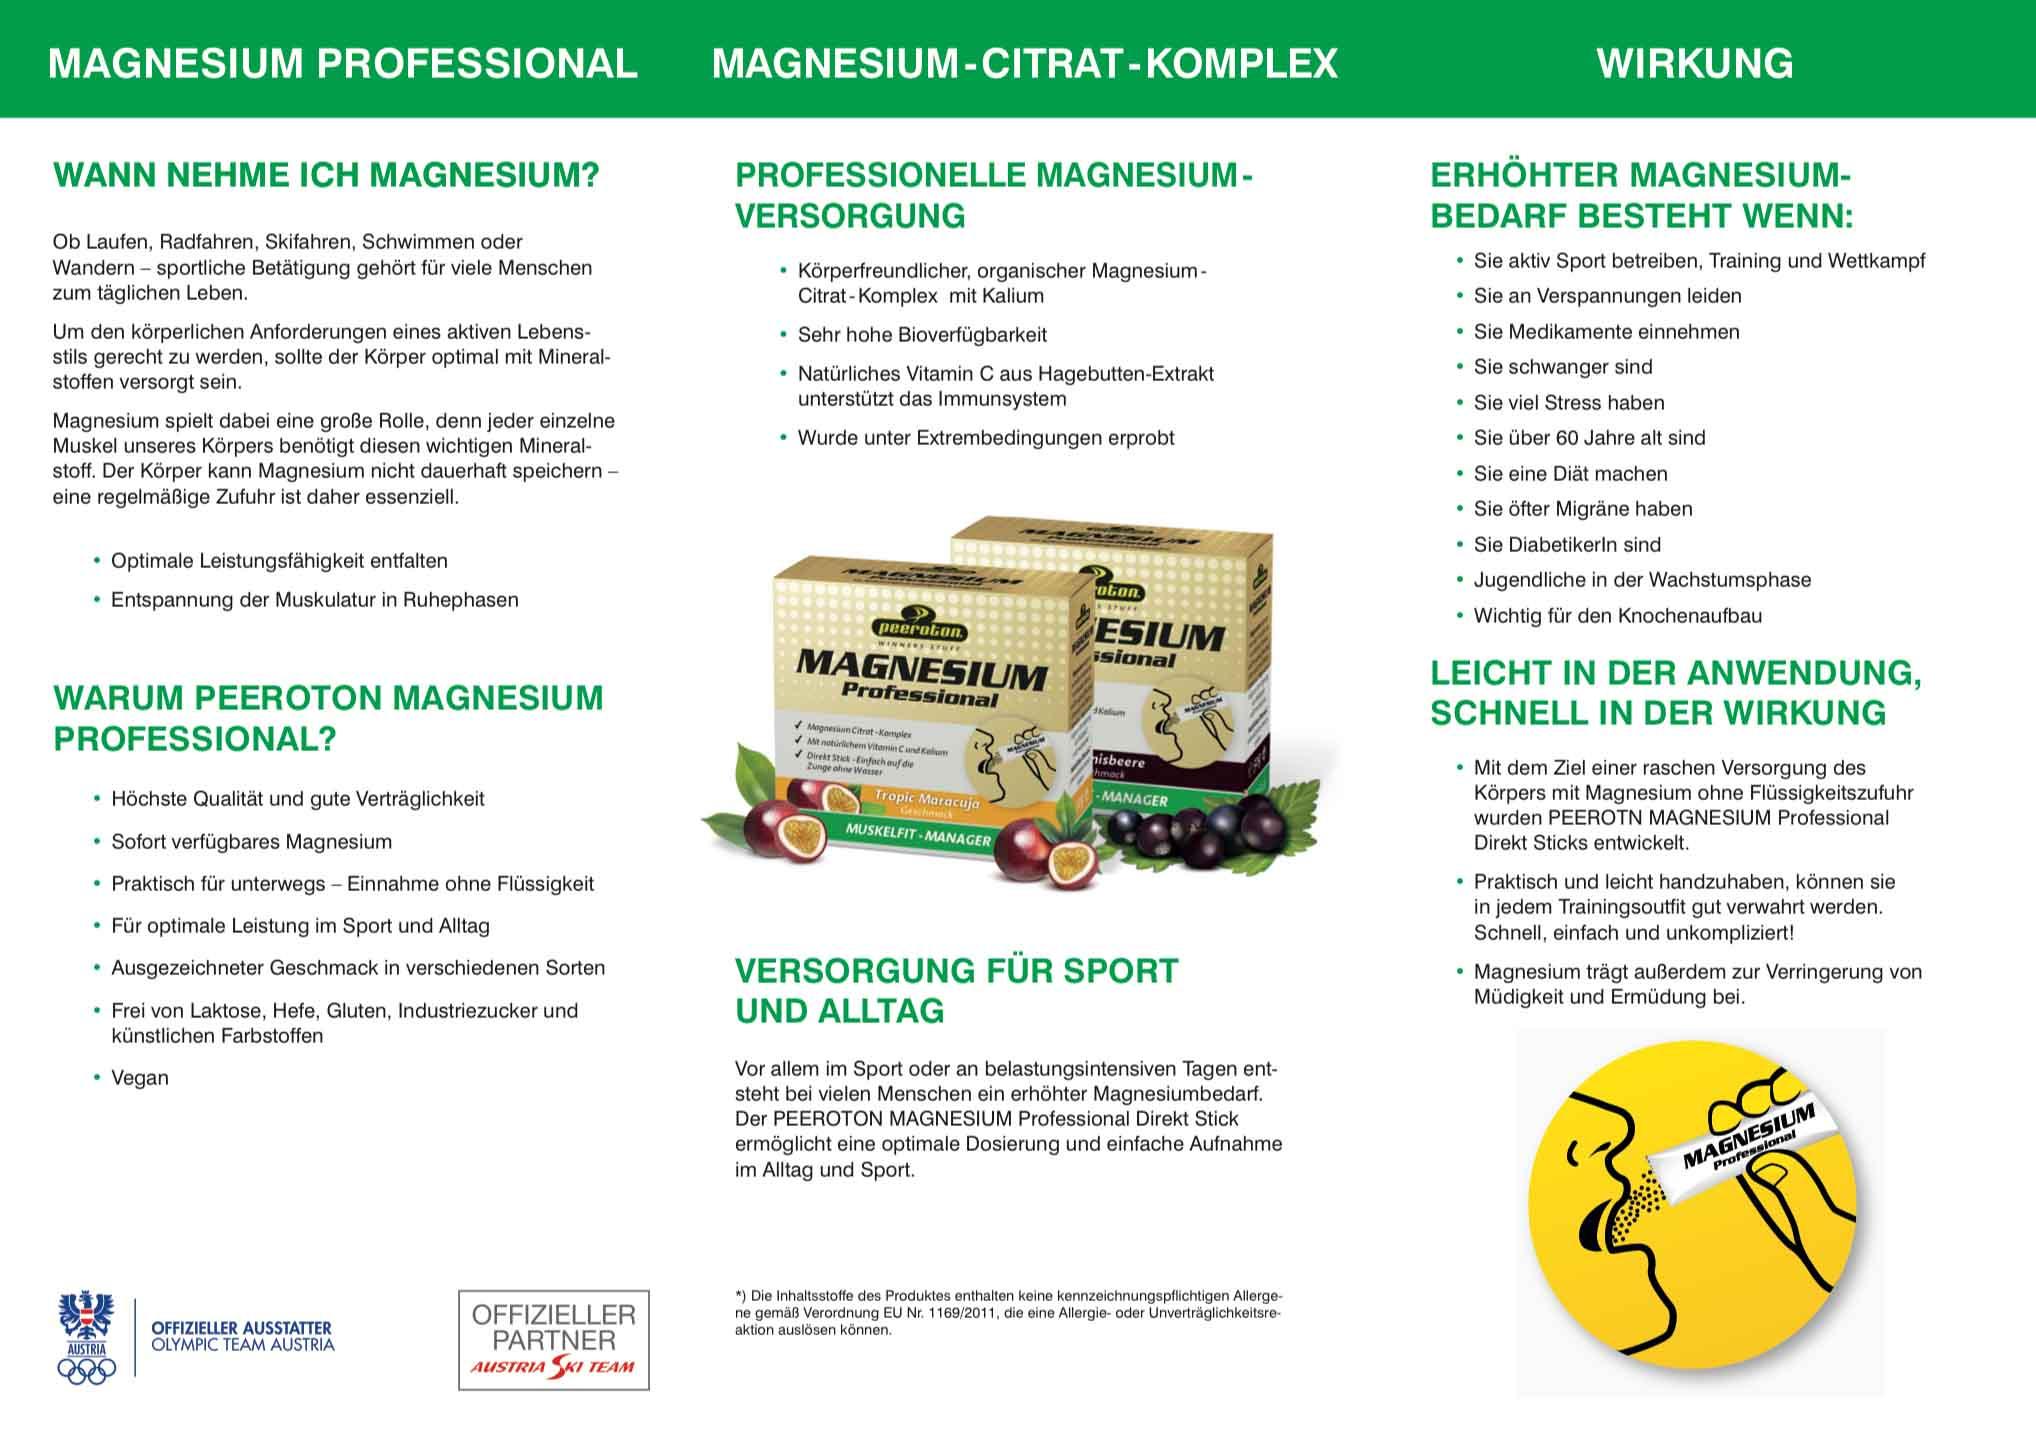 Magnesium-Professional-Peeroton-2re7jin6UiWgIH